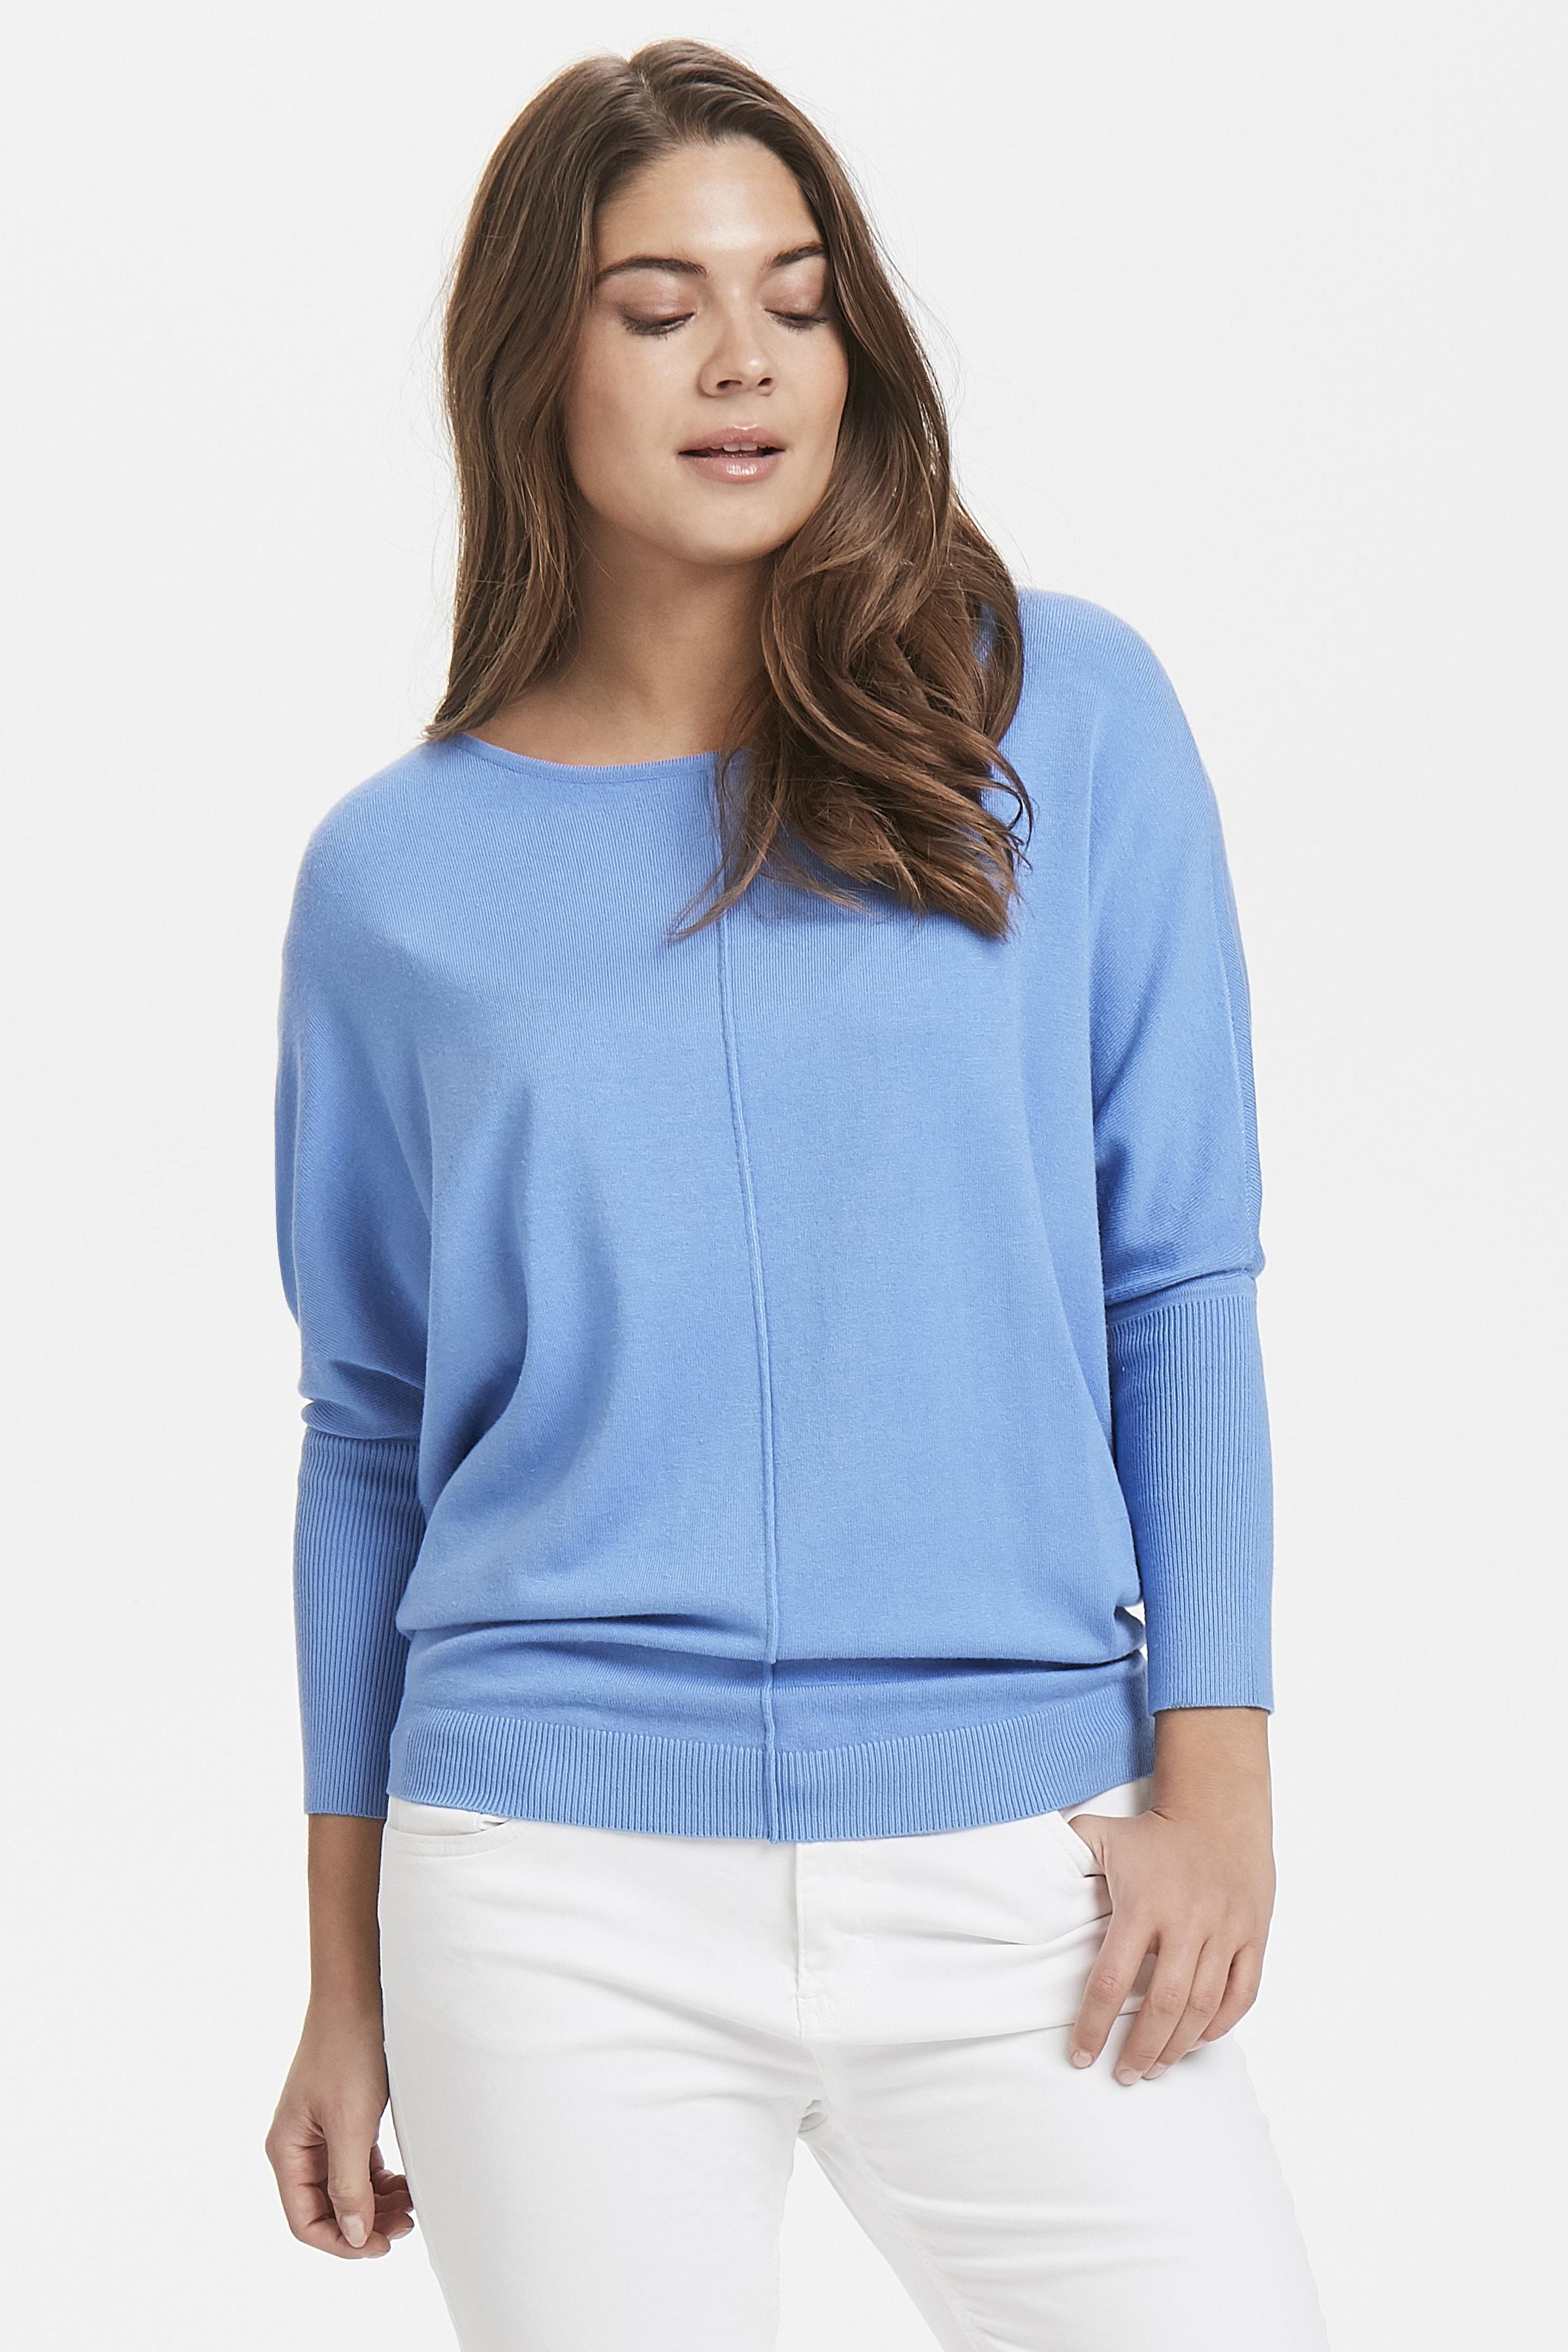 MEL. Cornflower Blue Pullover van b.young – Koop MEL. Cornflower Blue Pullover hier van size XS-XXL